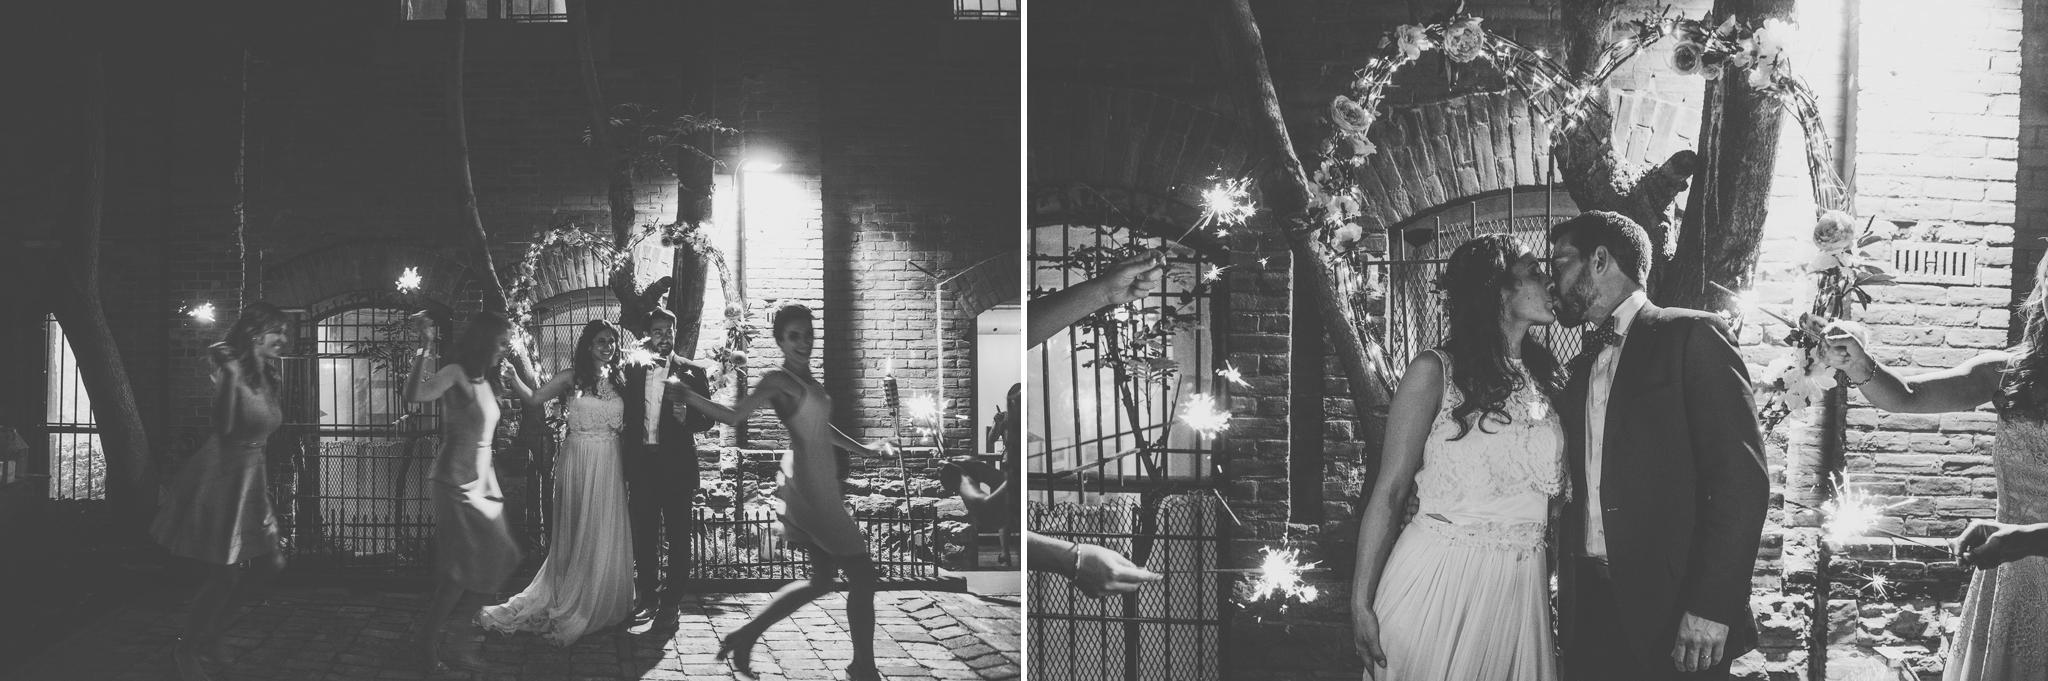 Downtown Toronto wedding, Toronto Wedding, brick, urban, urban toronto wedding, urban wedding photographer, urban wedding photographer, Toronto Wedding Photographer, Downtown Toronto, Toronto Photographer, Berkeley Church, Berkeley Events, Berkeley fieldhouse, bride, groom, bride and groom, couple, bridal portrait, portrait, romantic, intimate, church, church wedding, dramatic light, window light, unique location, candids, wedding guests, ceremony, bride, groom, wedding ceremony, aisle, musician, cocktail hour, party, wedding decor, wedding tables, wedding gifts, table settings, wedding details, wedding reception, reception, first dance, bride groom dance, dance, guests, candids, sparklers